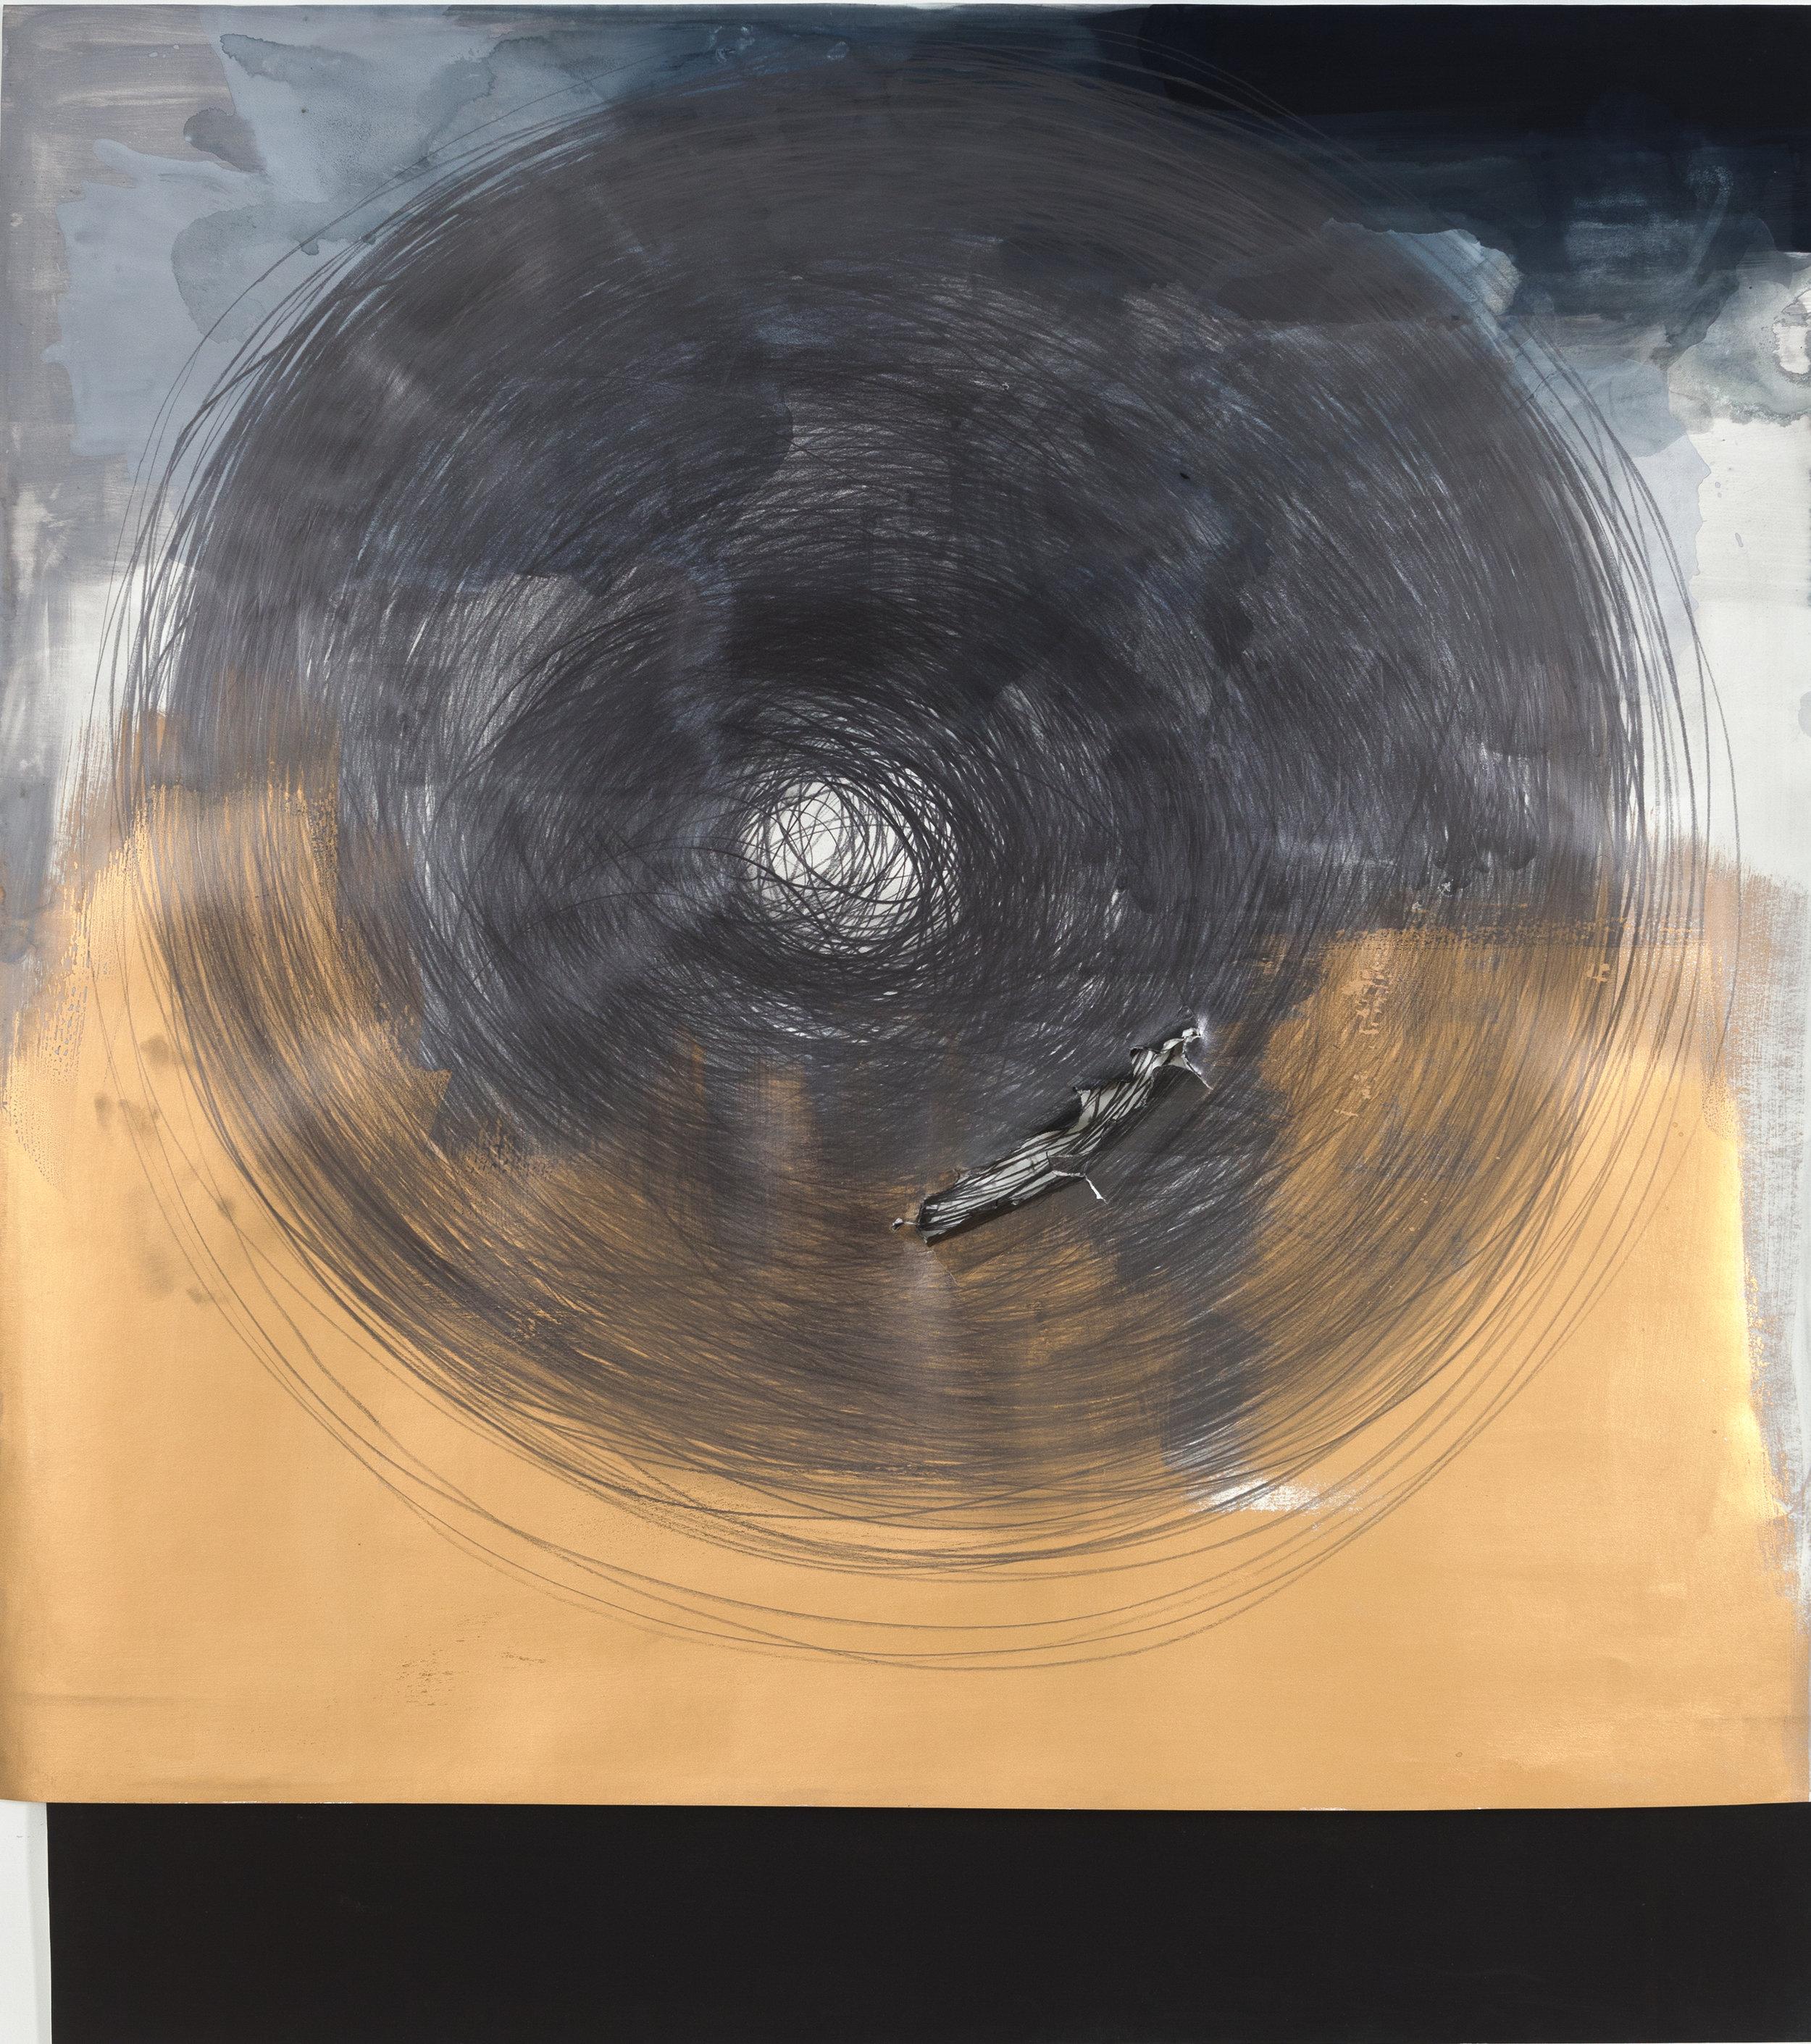 Circle Drawing: Gold / Grey-Blue Watercolor, 1hour 22minutes (2018)